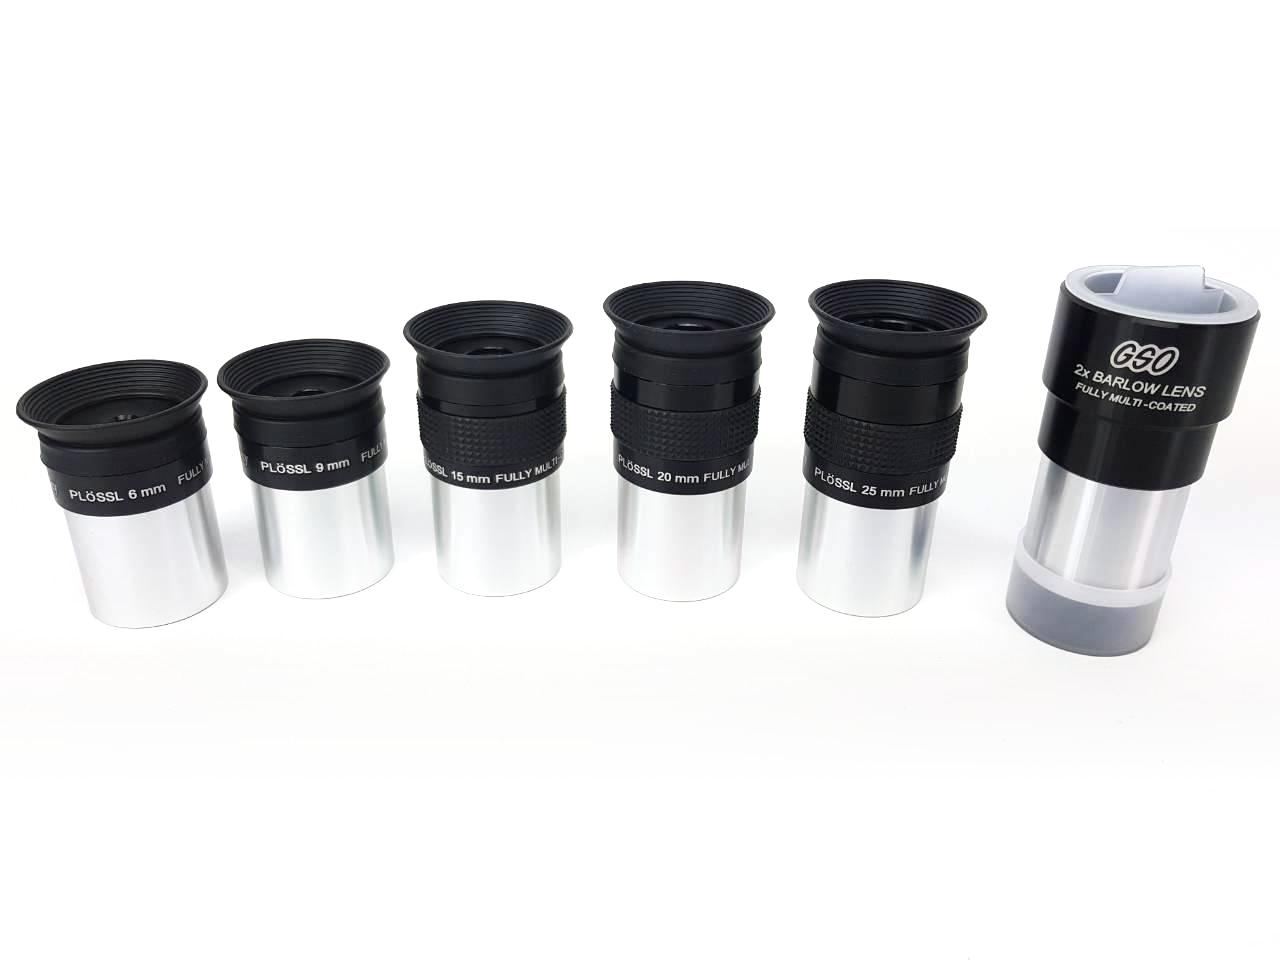 "Oculare tecnosky Super Plossl da 25mm - 1.25"" - 52° FOV - Fully Multi Coated"